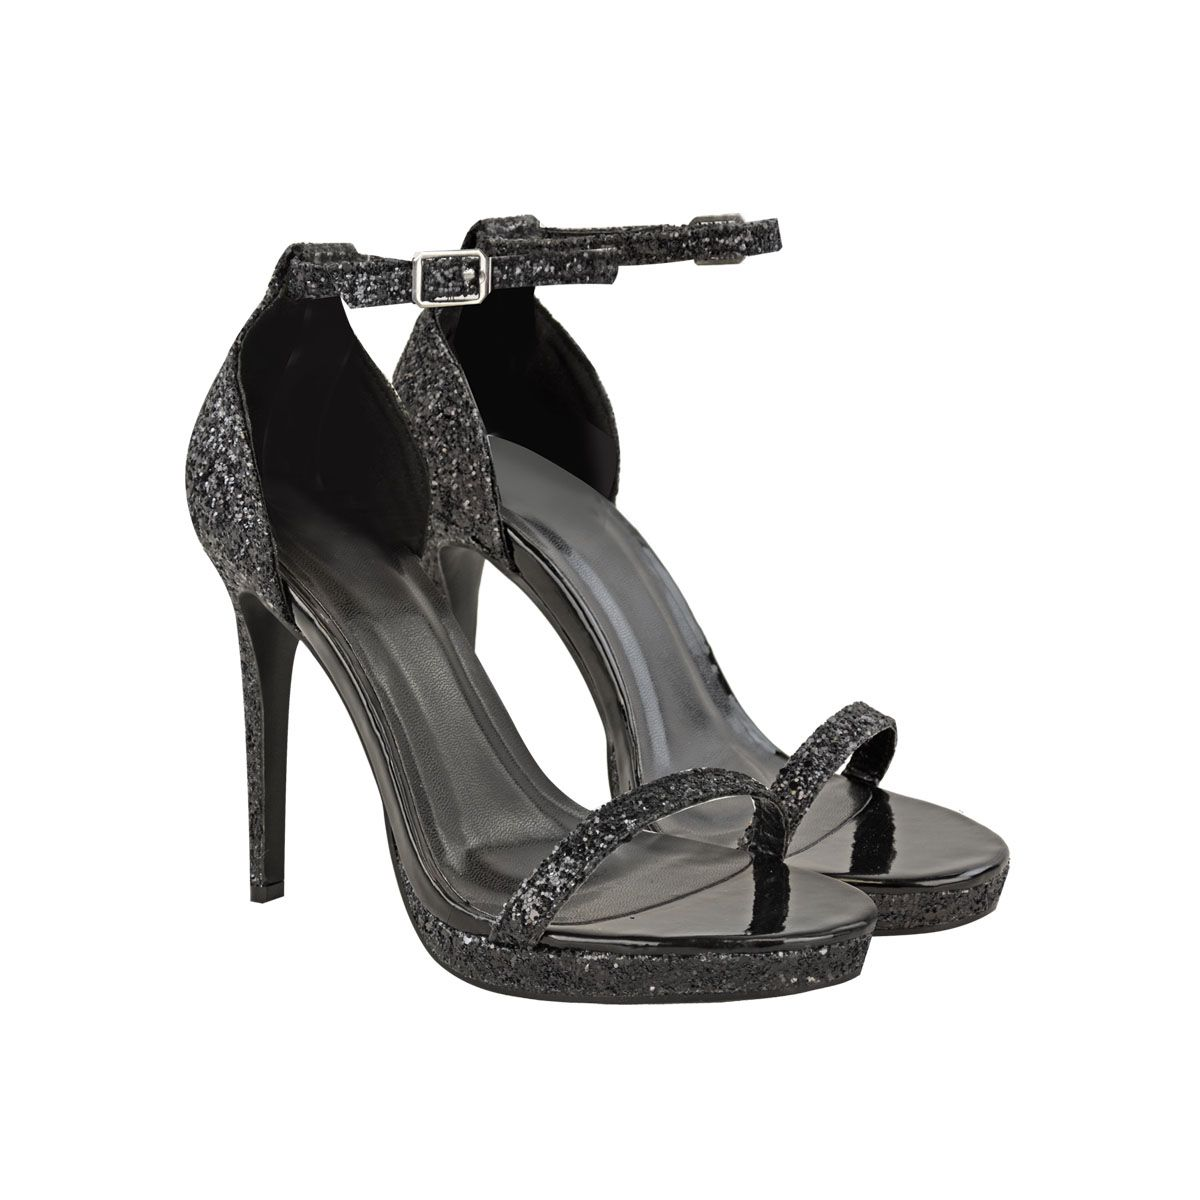 Black nina sandals - Black Glitter Ankle Strap Platform Peep Toe Stiletto Sandals Nina